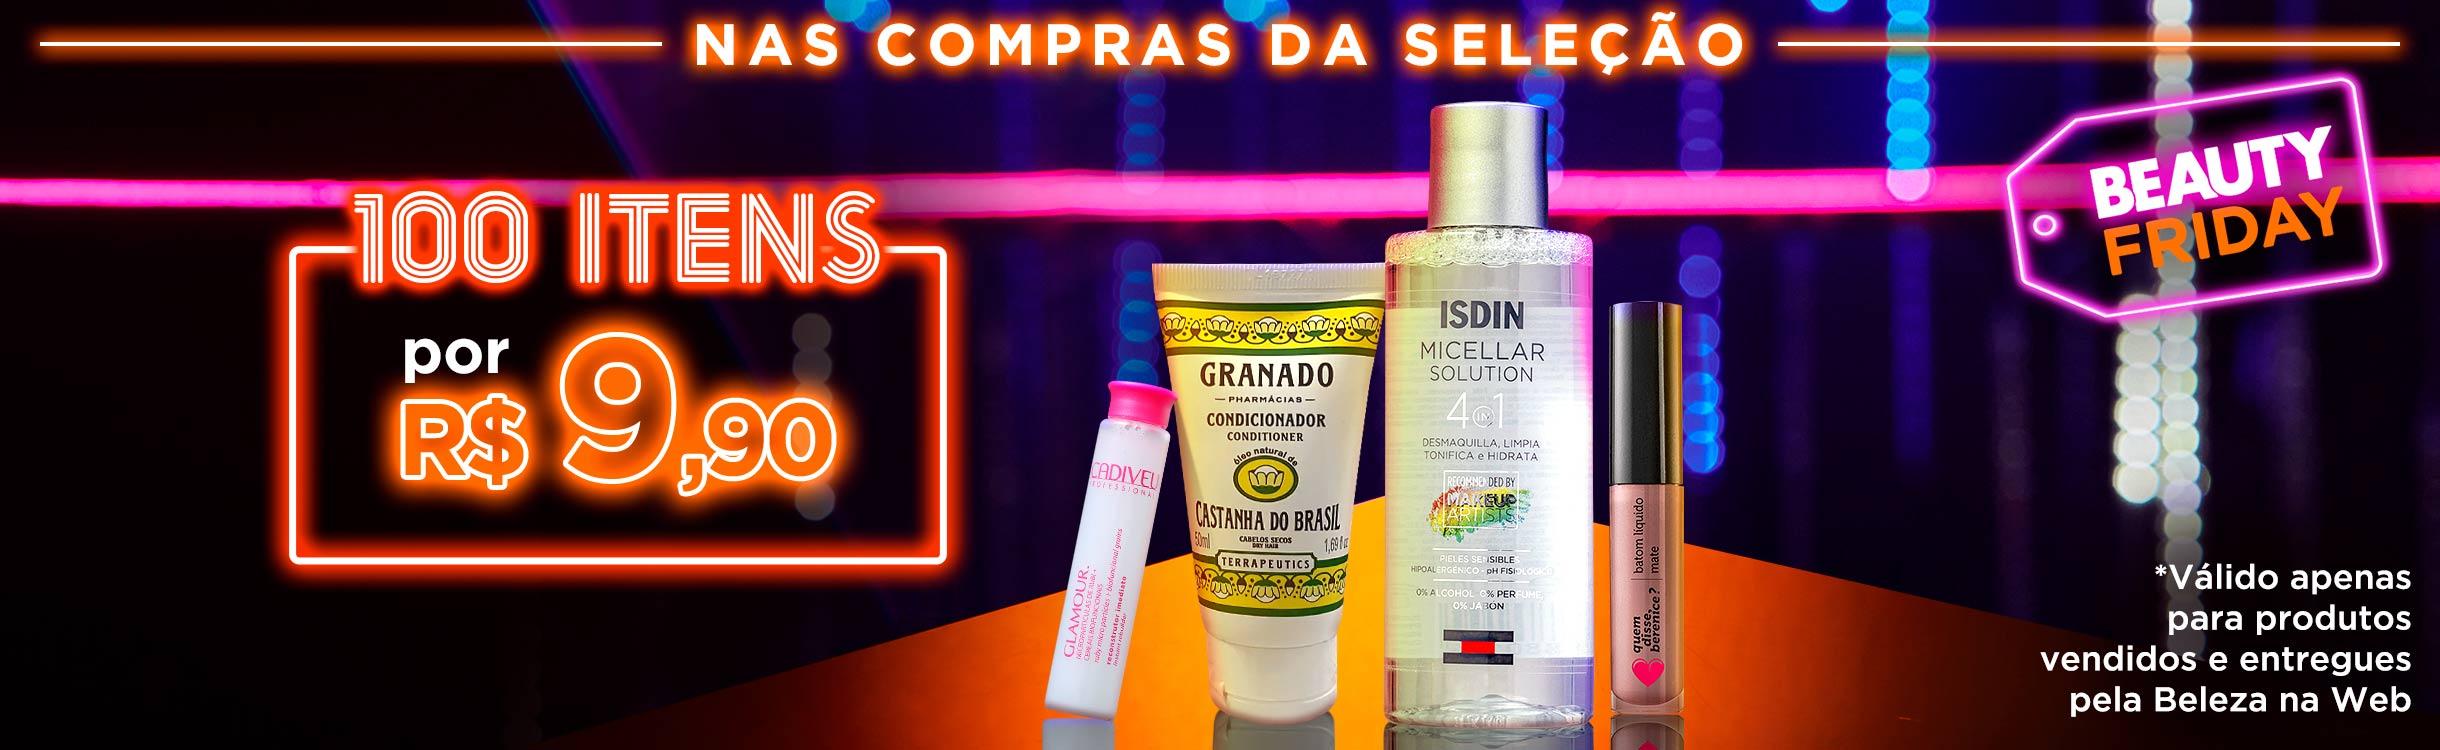 Beauty November | Desejos de Beleza até R$9,90